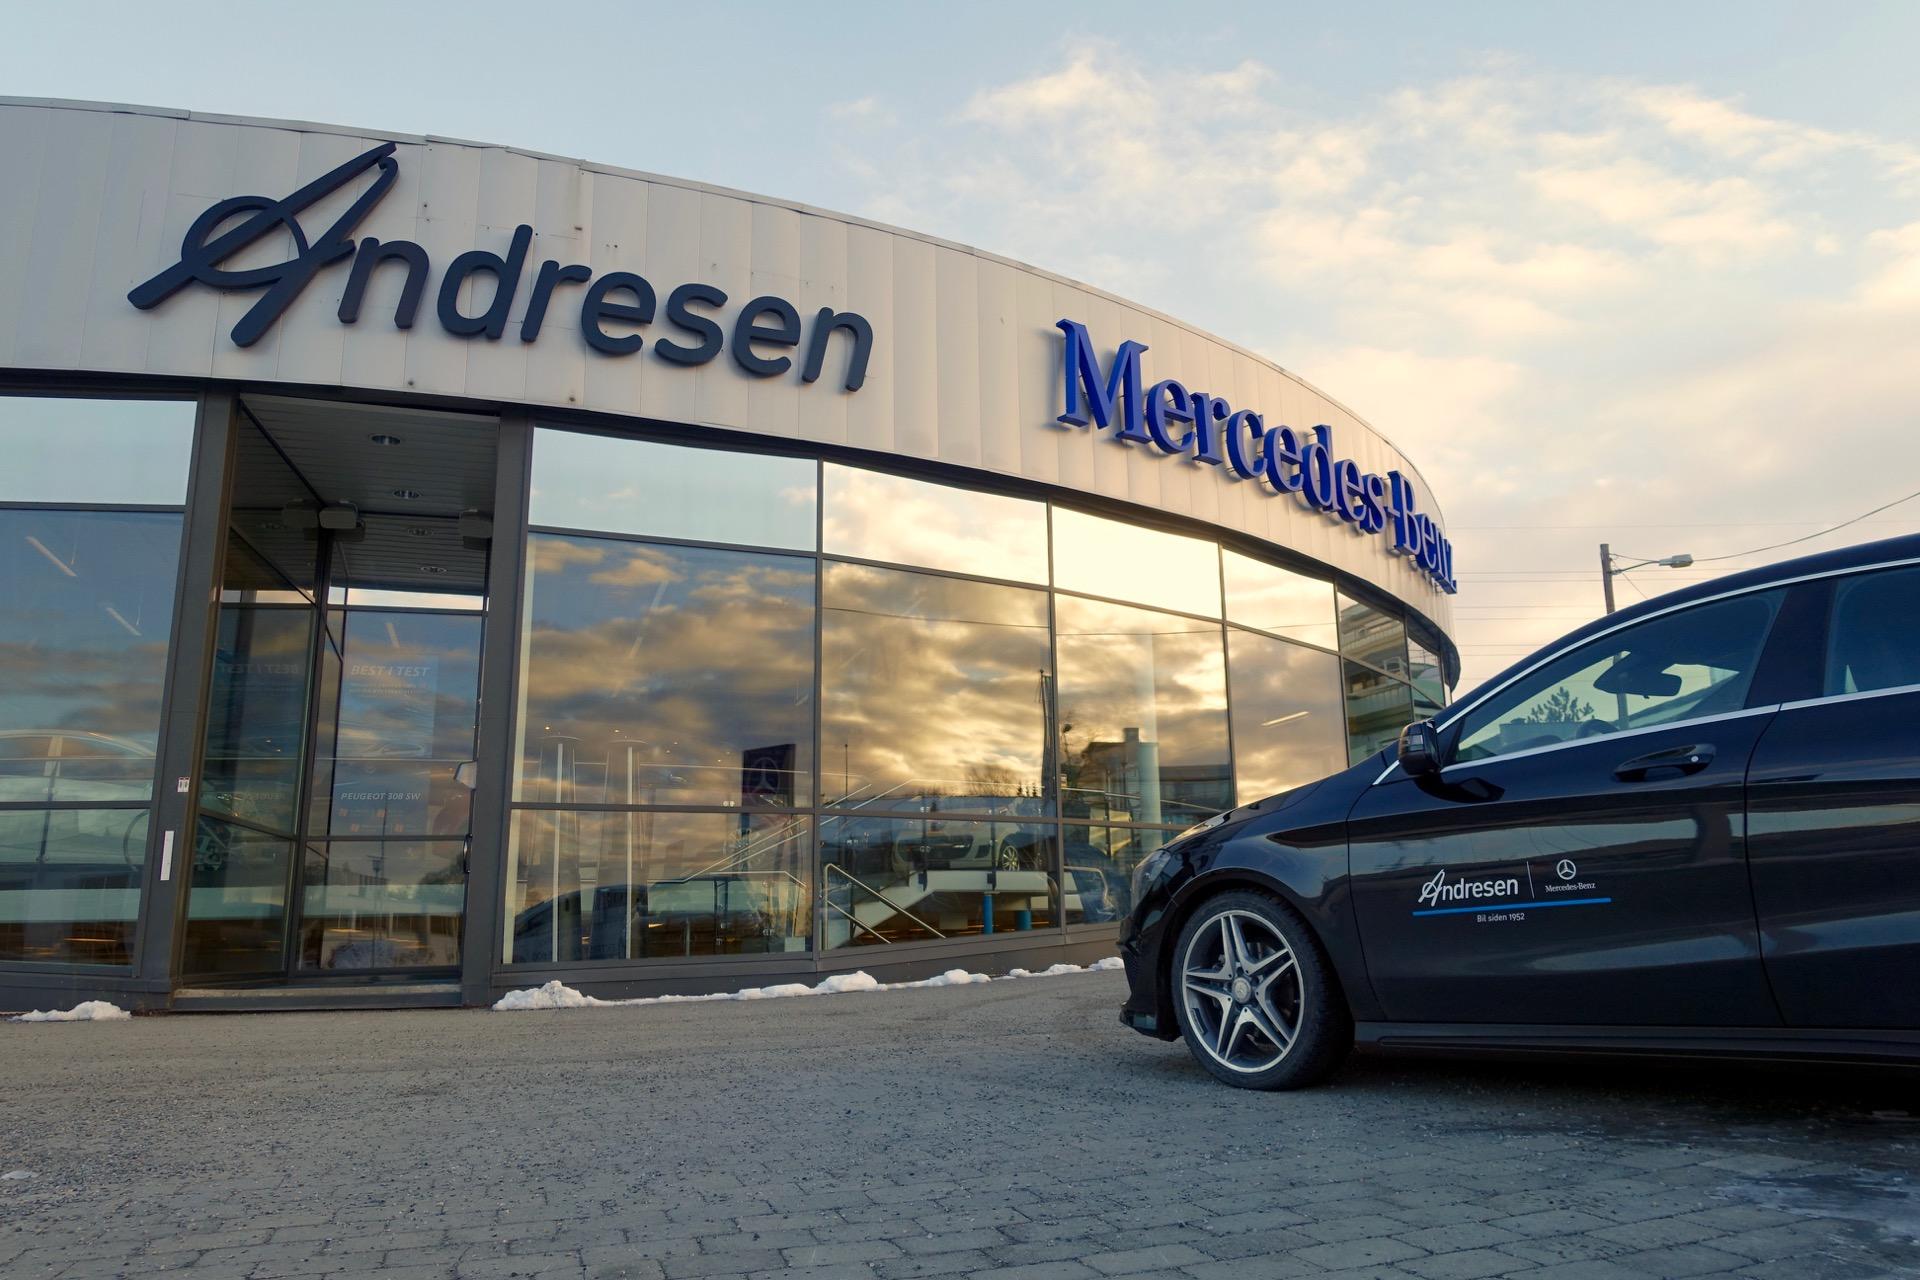 Andresen Ski - Mercedes-Benz